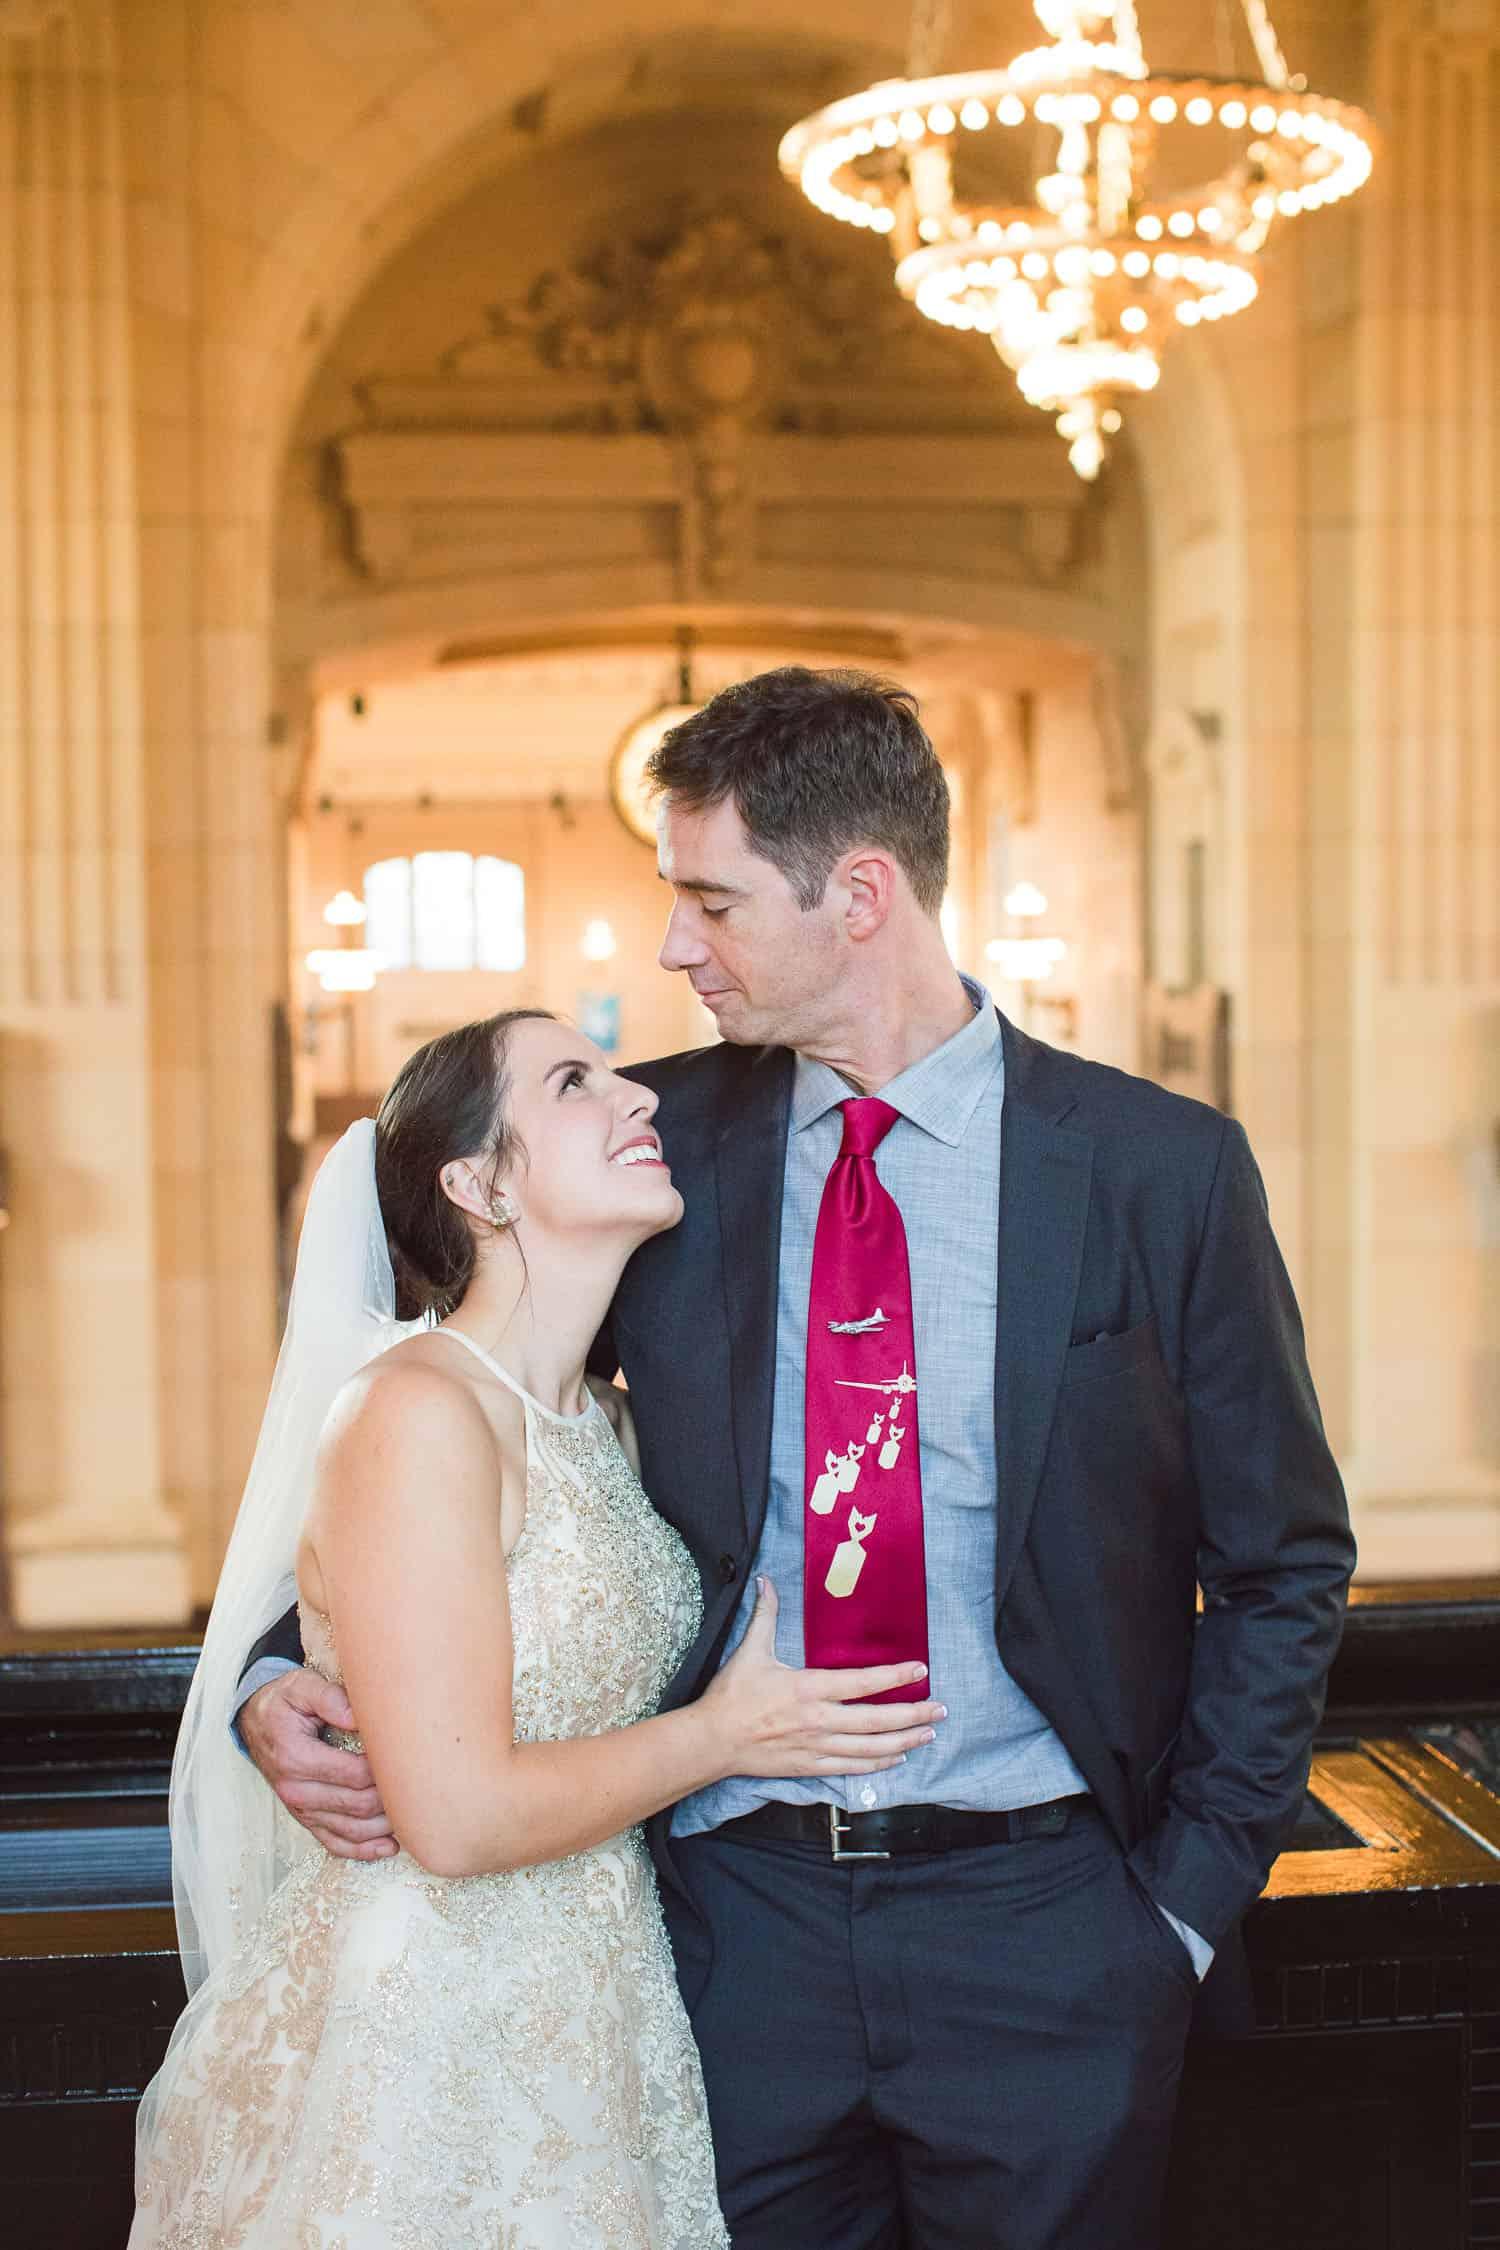 Union Station wedding portraits